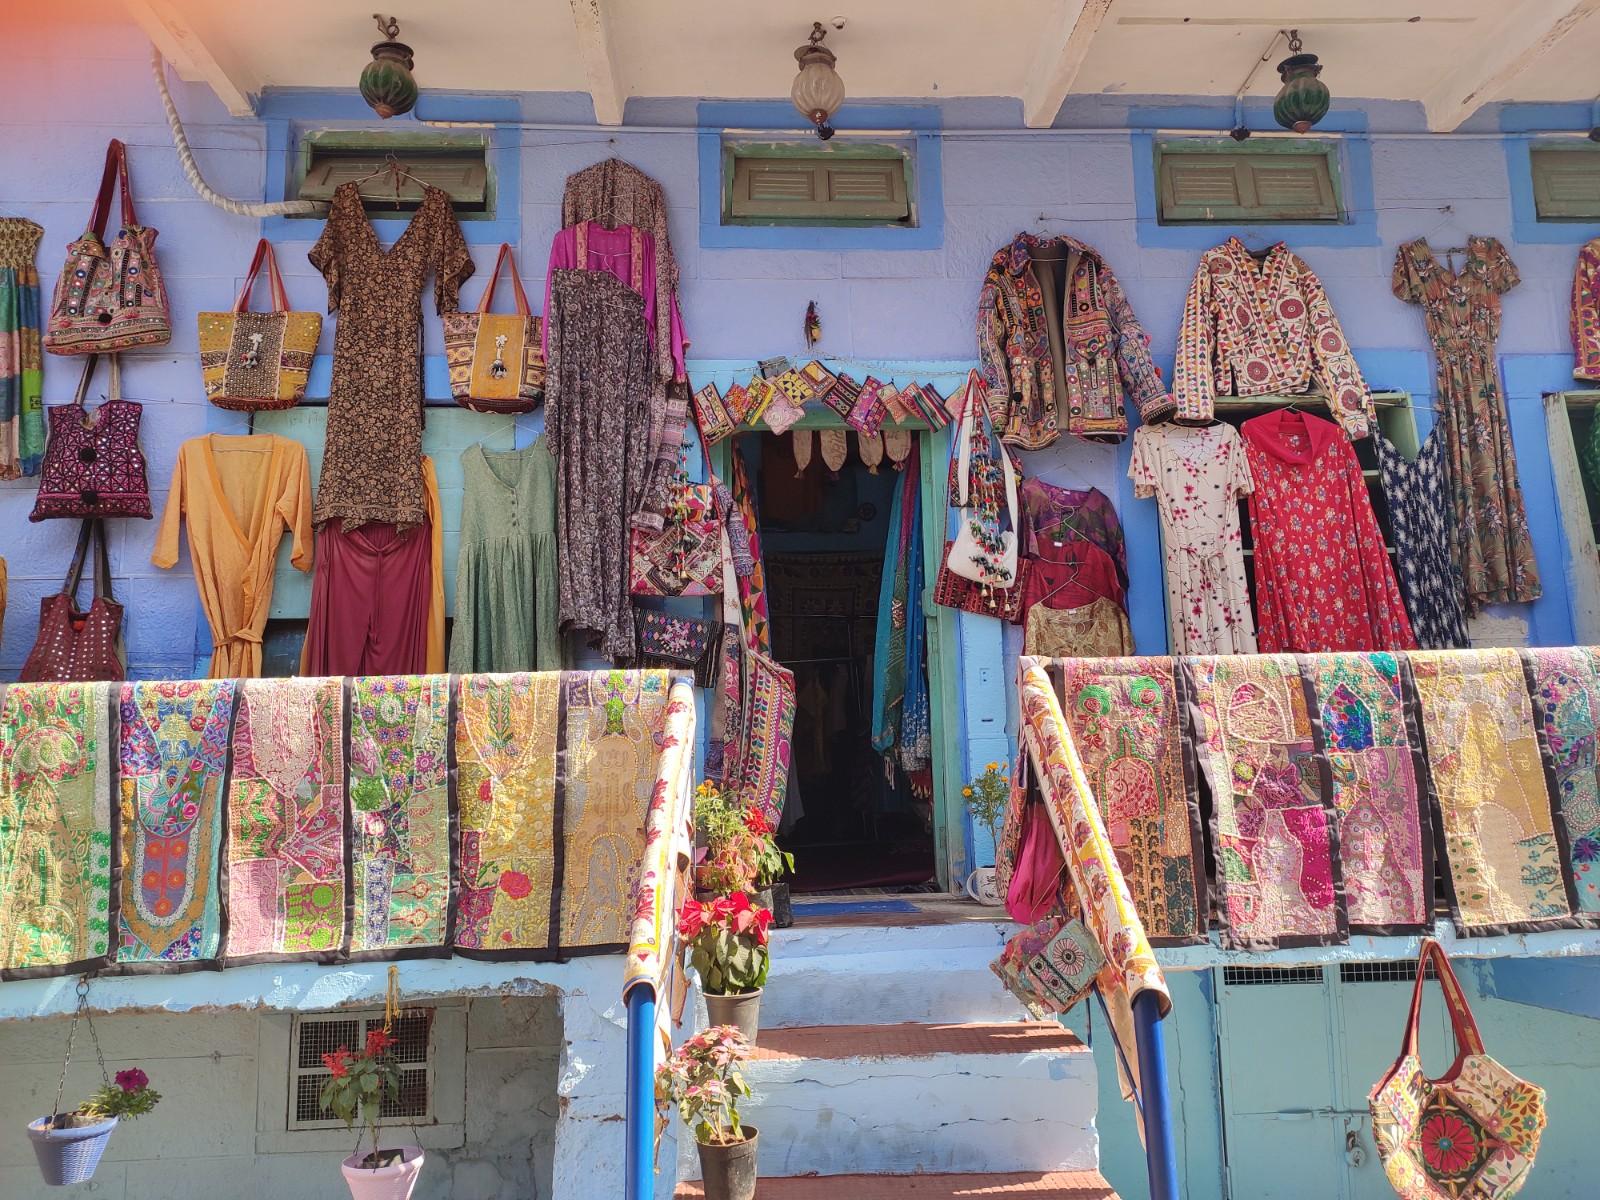 Shopping in Jodhpur, India